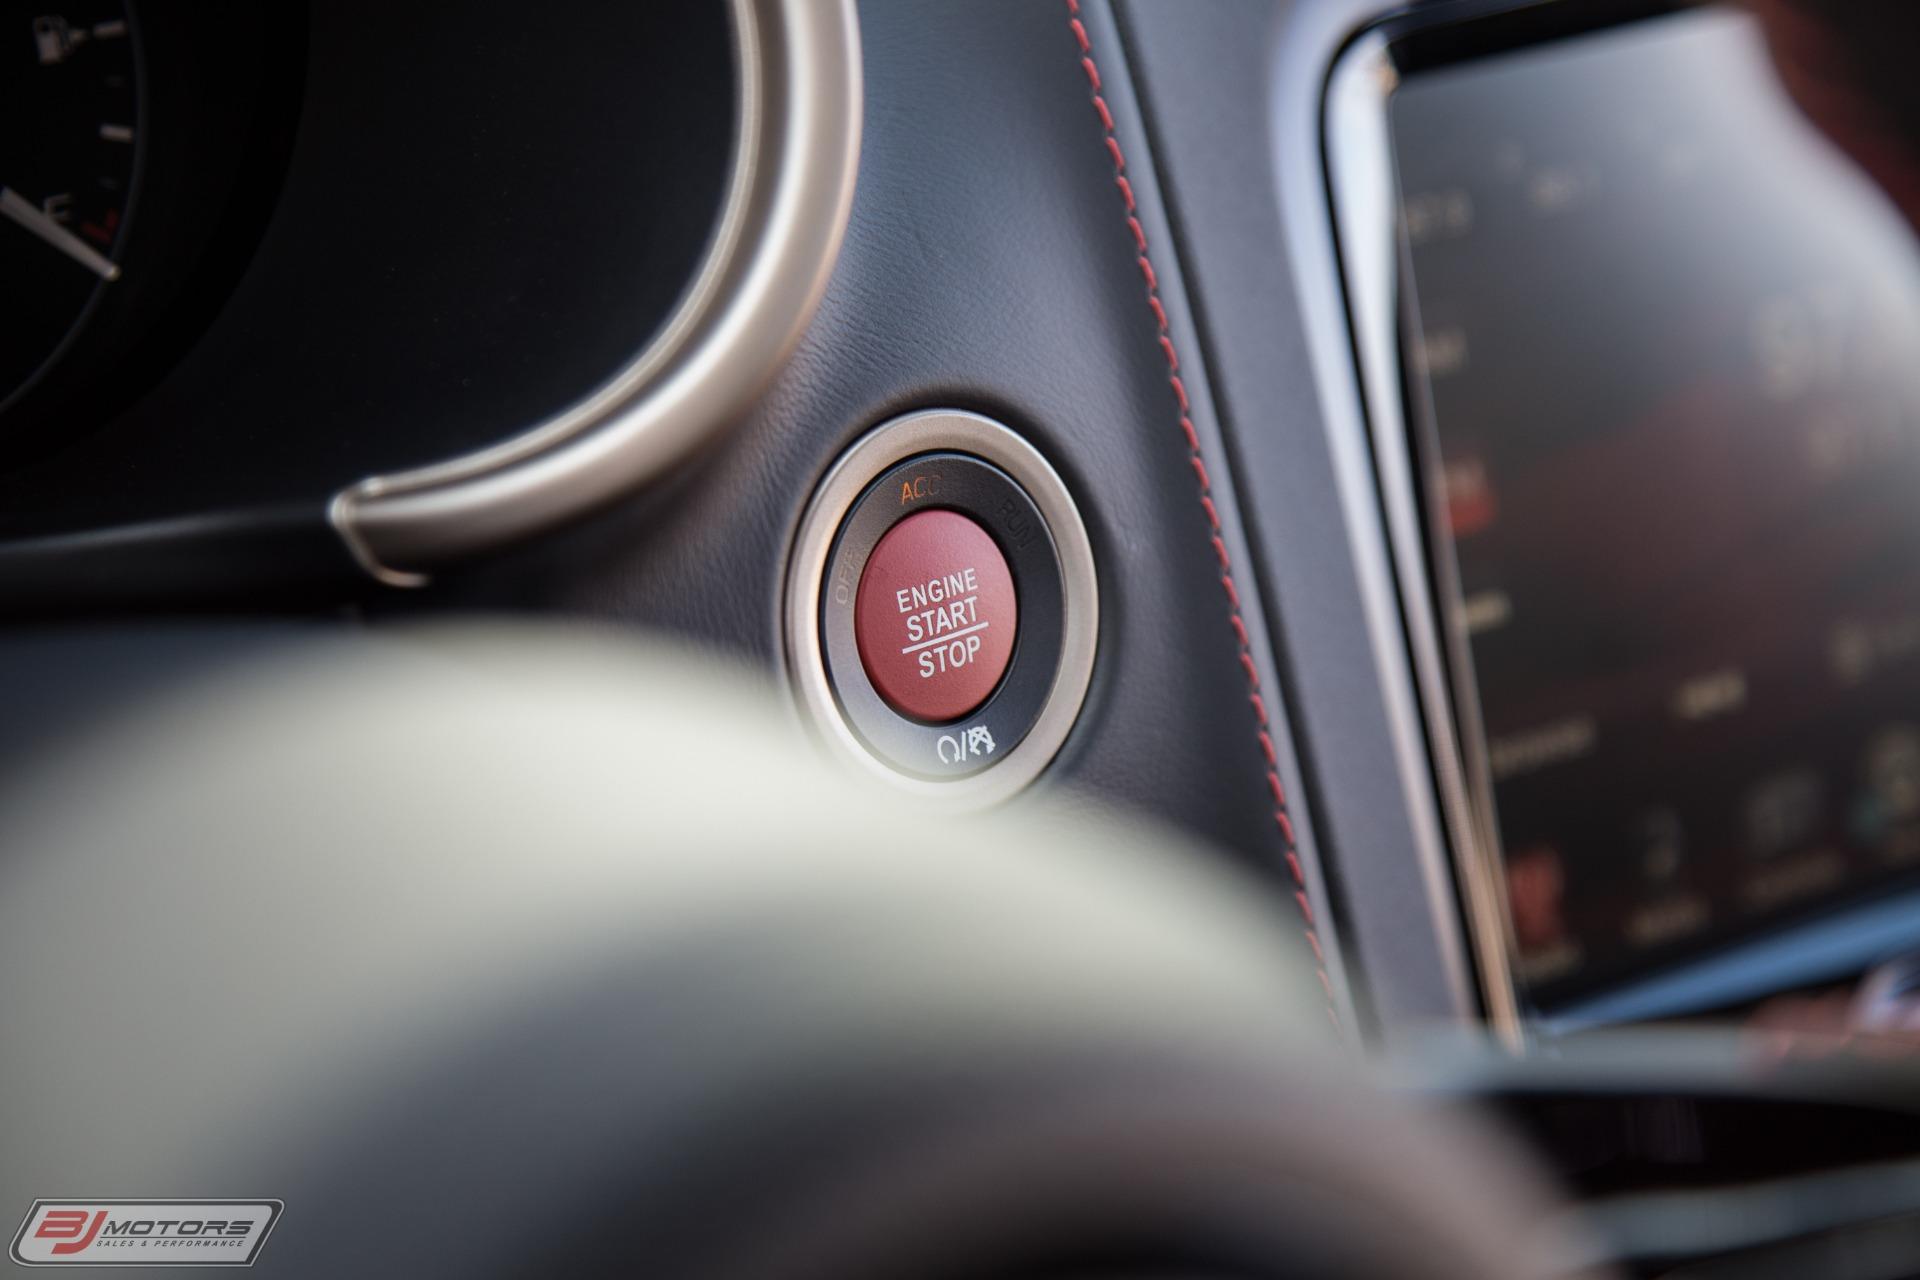 New-2017-Dodge-Viper-Dealer-Edition